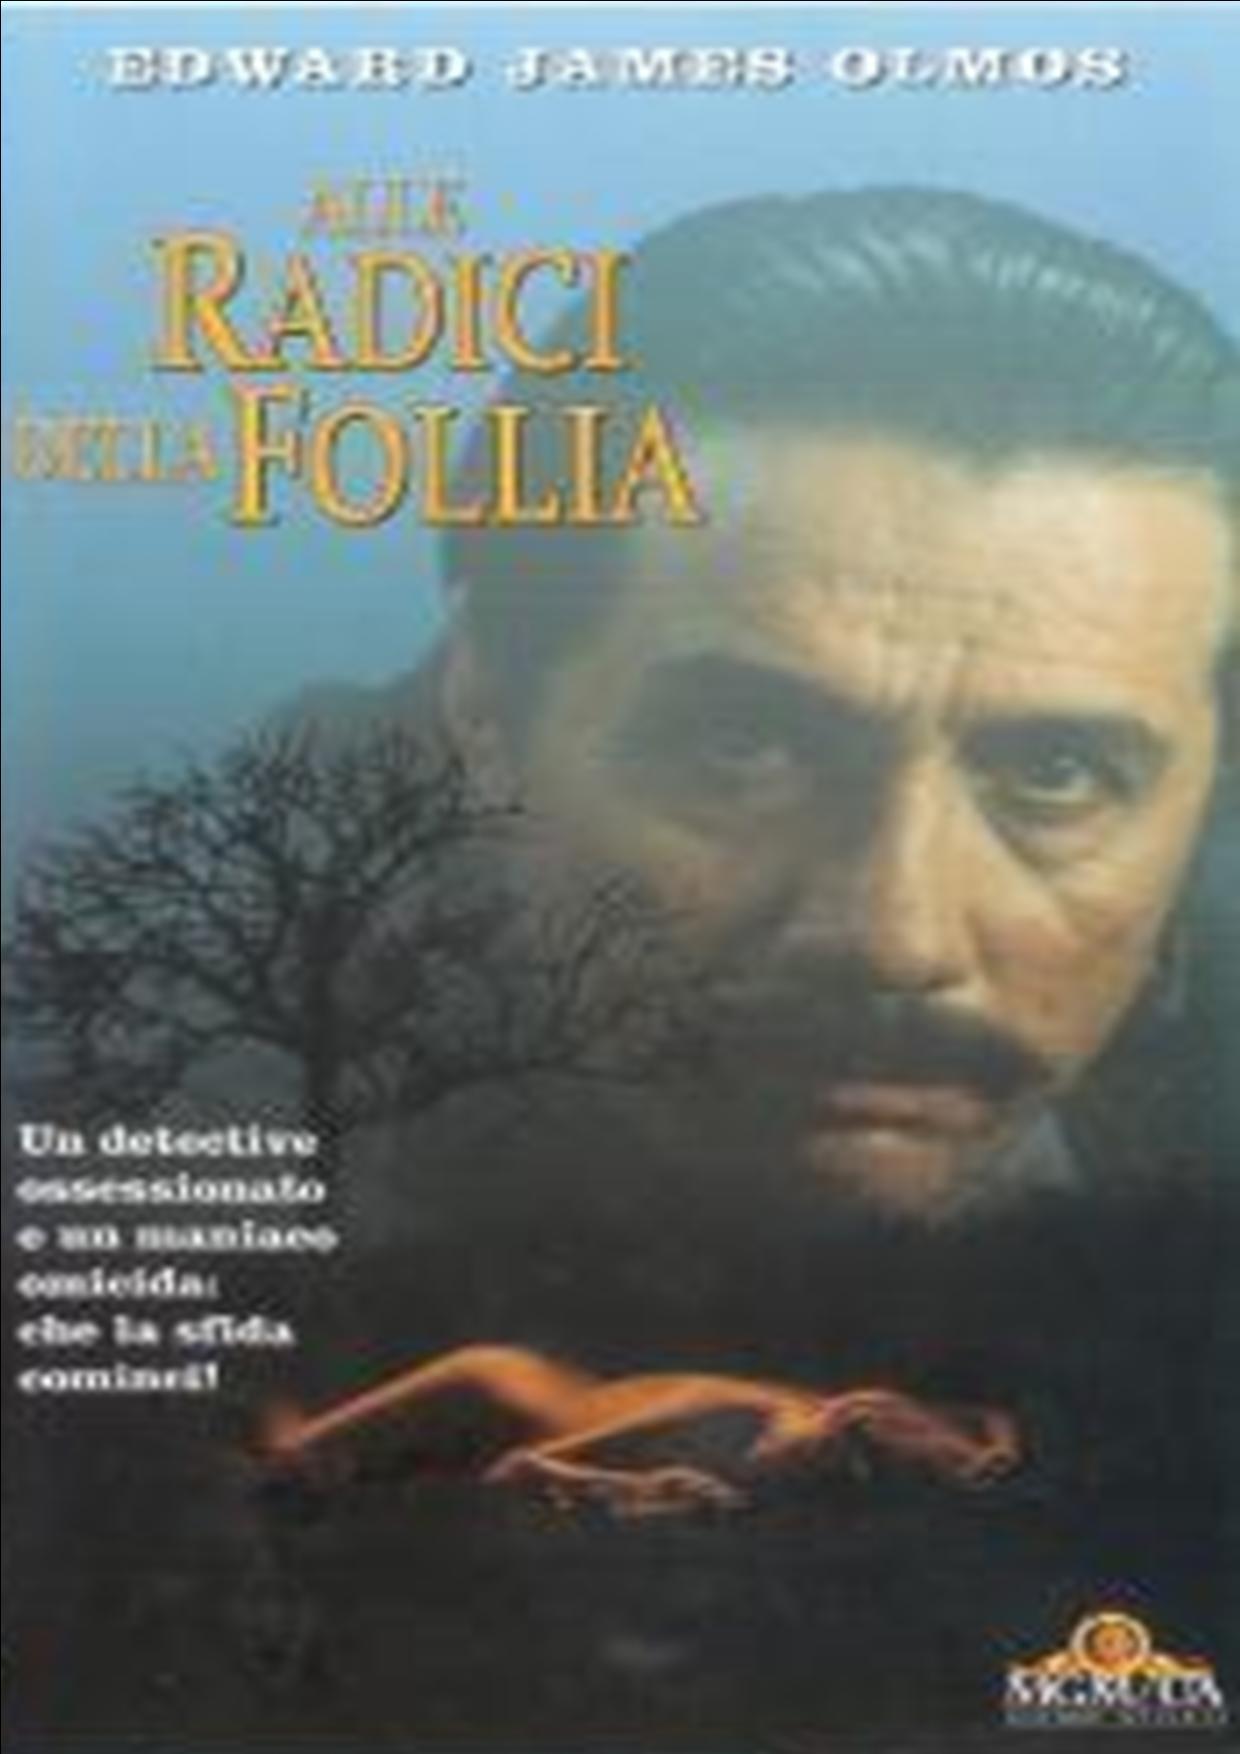 ALLE RADICI DELLA FOLLIA (VHS USATA EX NOLEGGIO) (VHS)